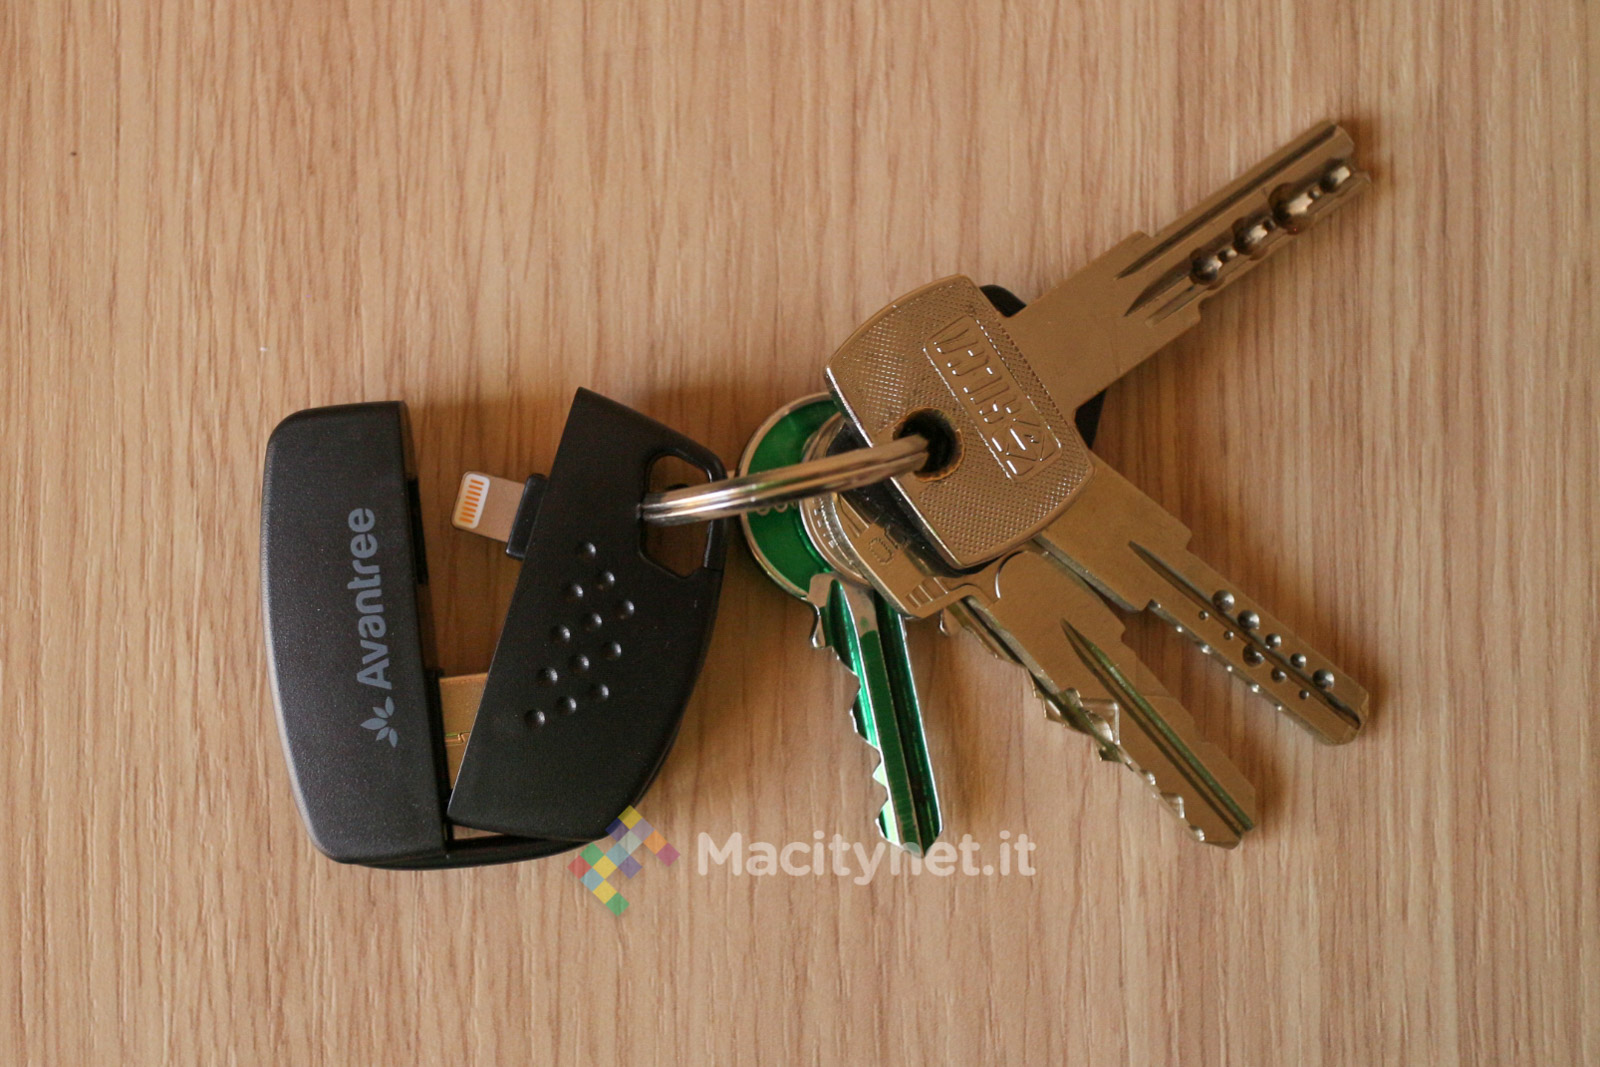 Recensione Avantree Keychain